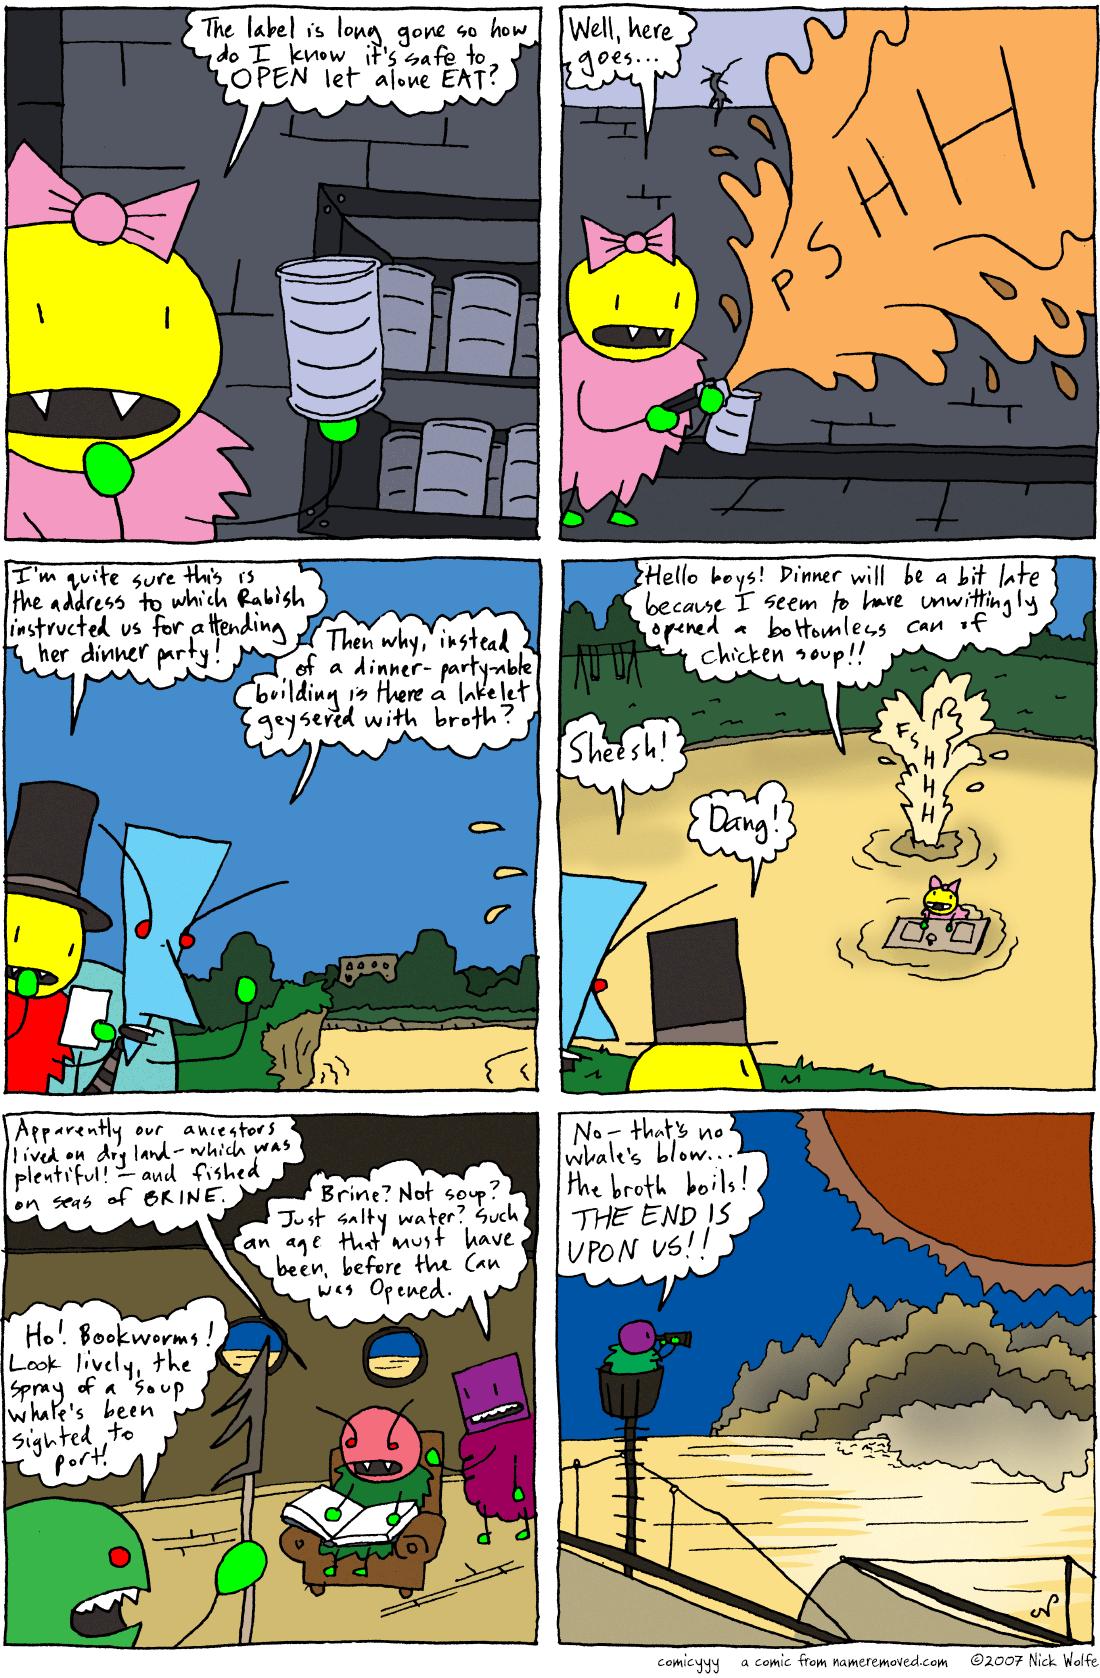 Tin (Soup)